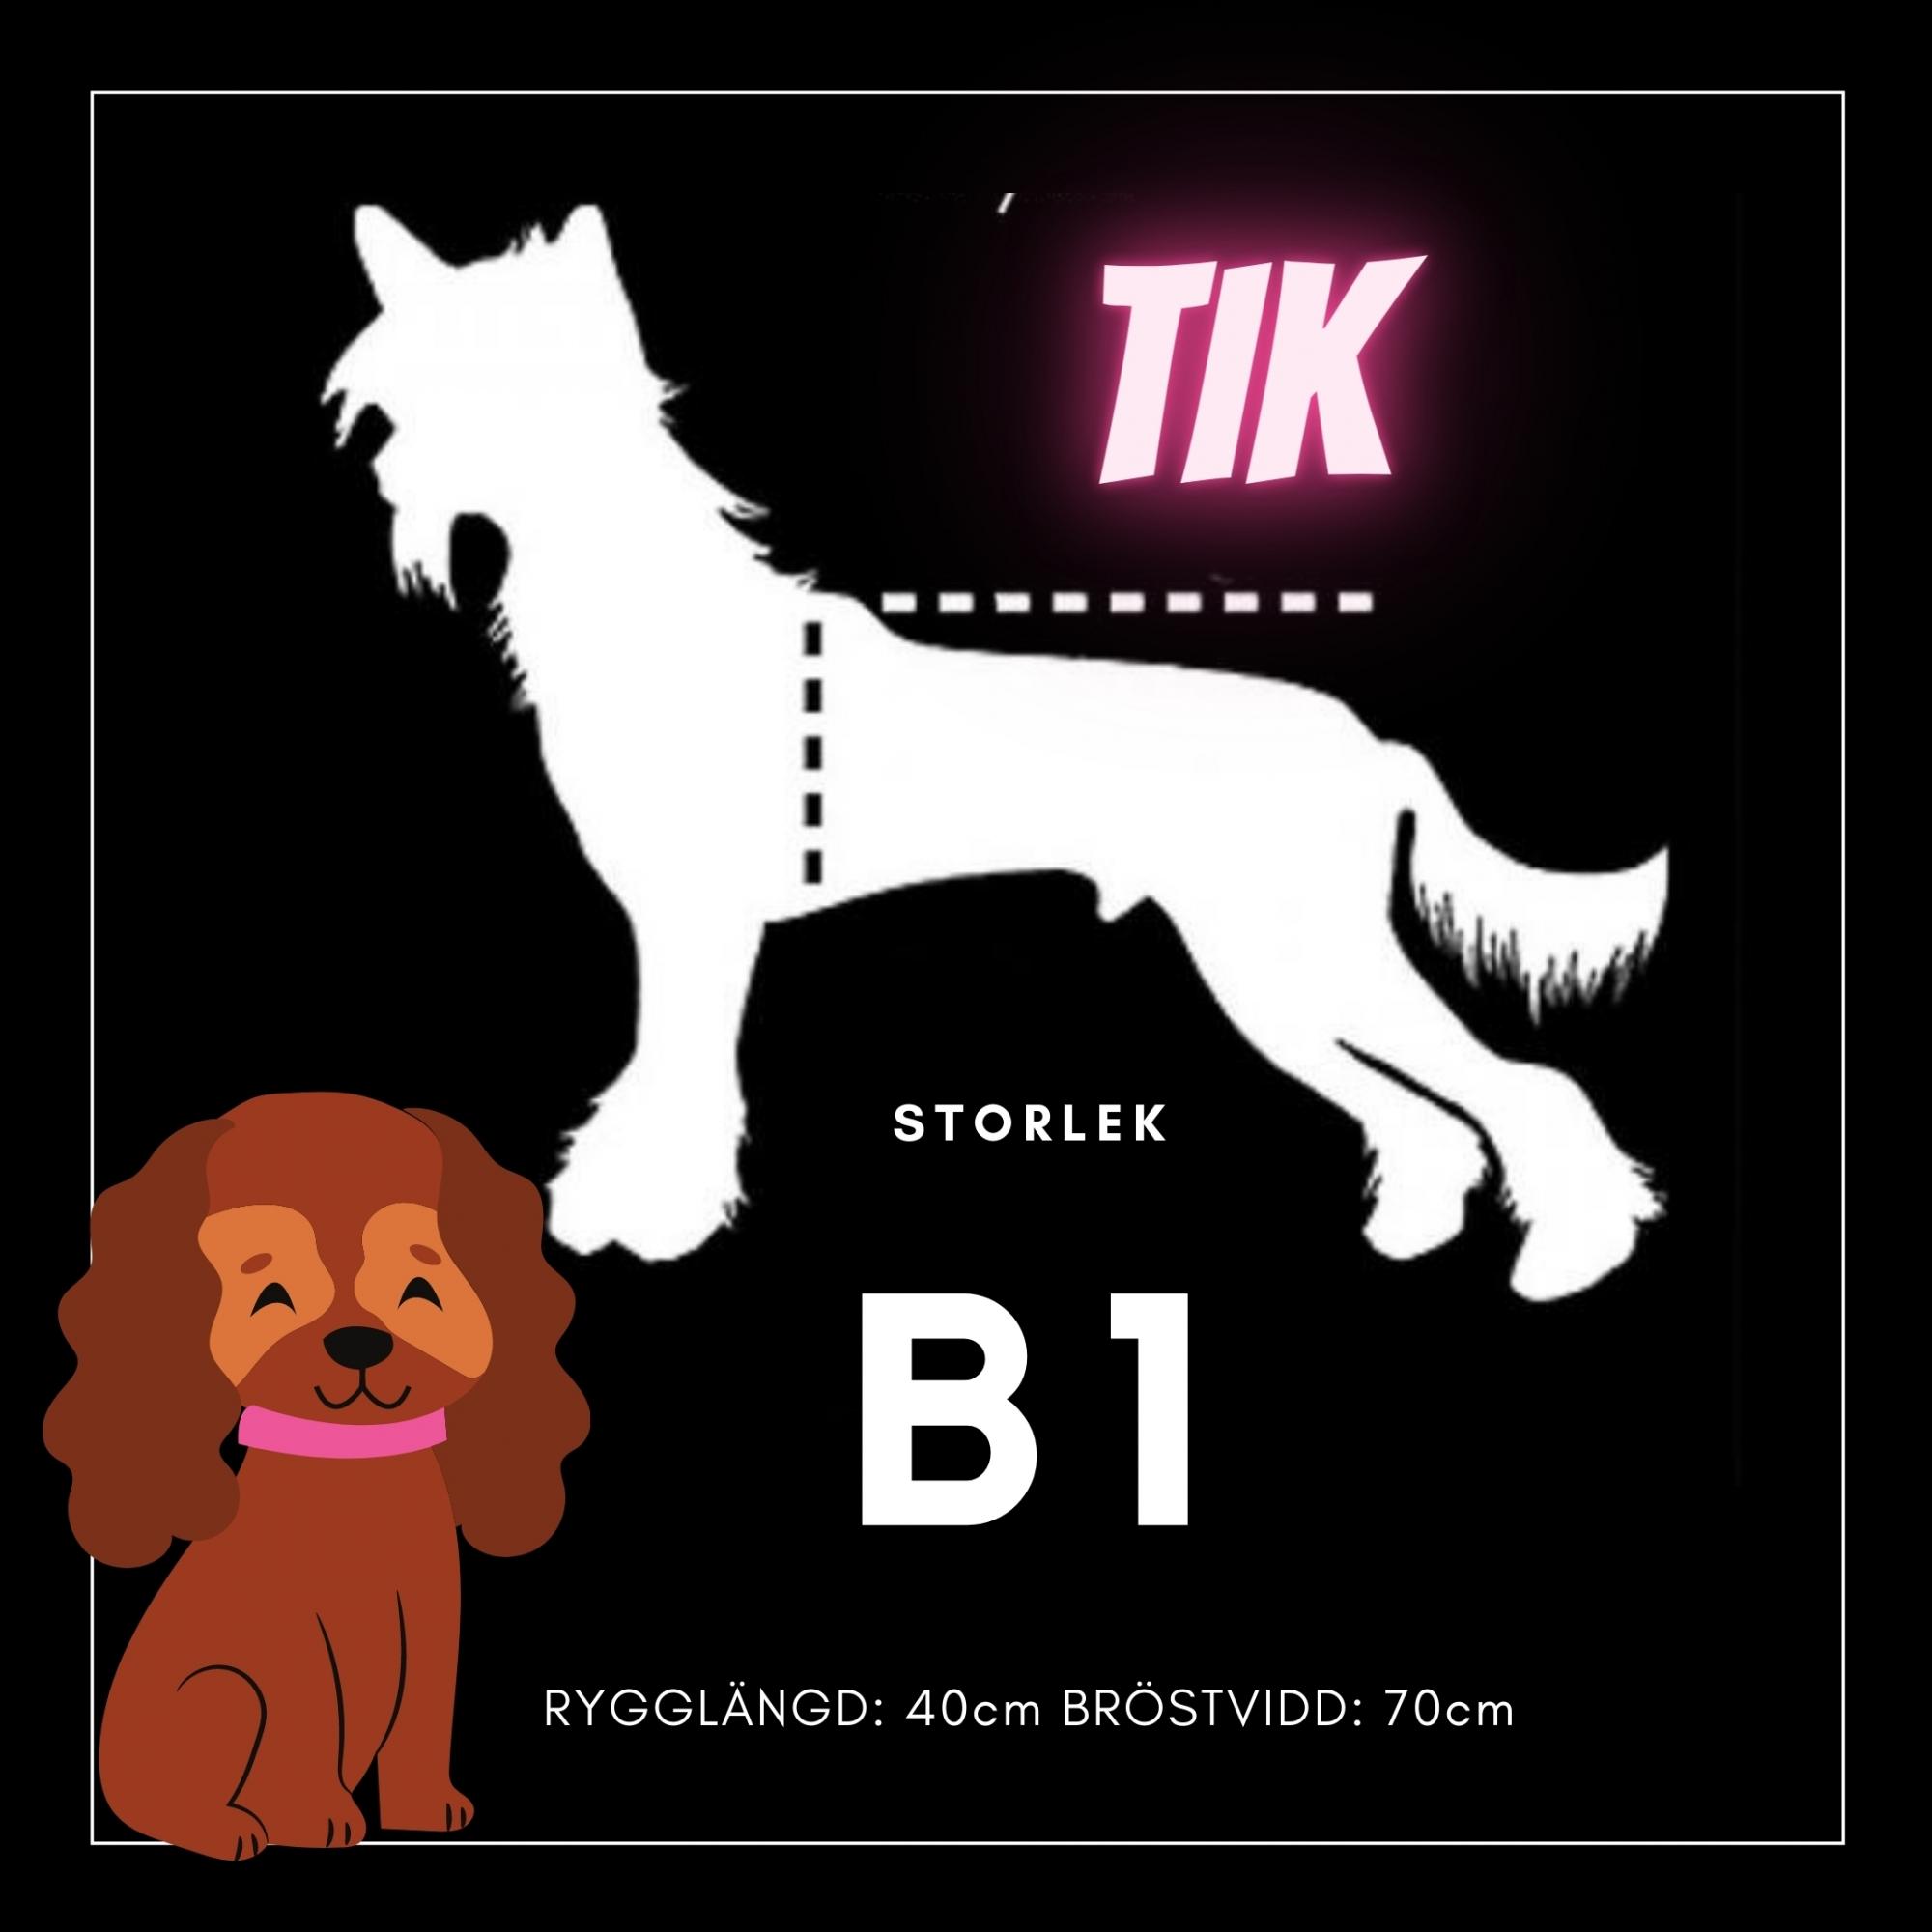 Tik Storlek B1 - Passion For Pet Fashion